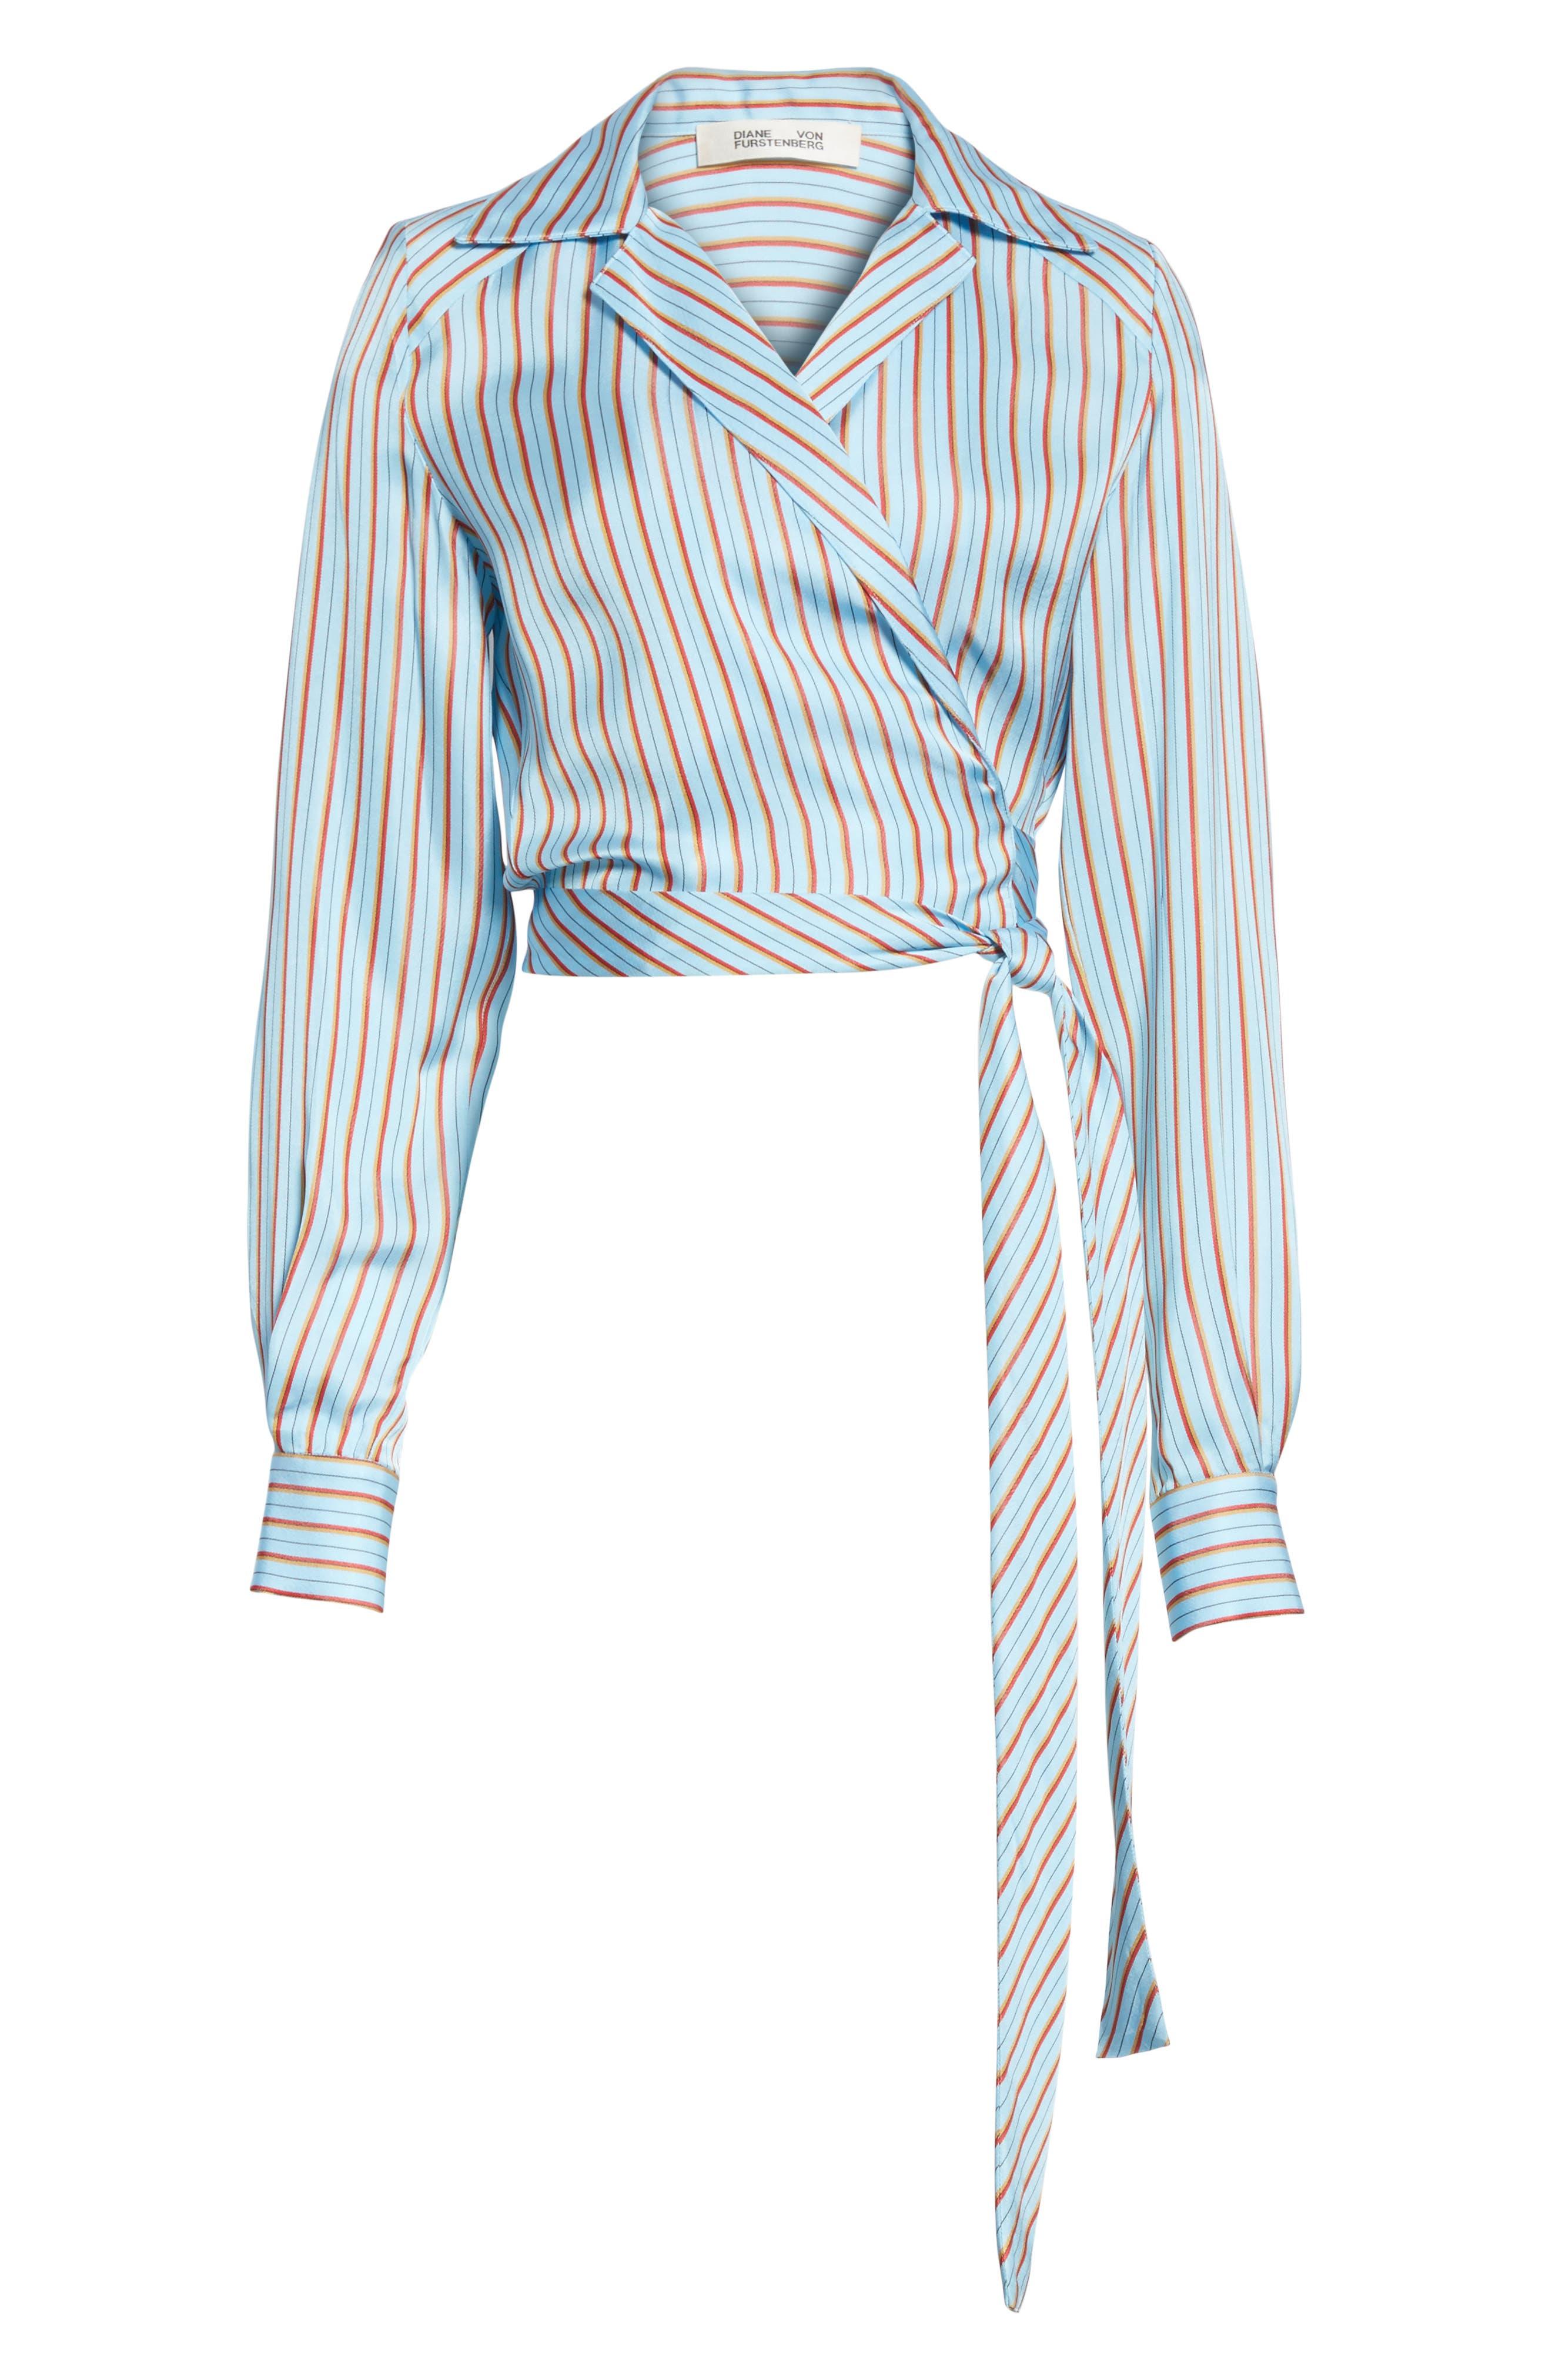 Diane von Furstenberg Stripe Wrap Top,                             Alternate thumbnail 6, color,                             477